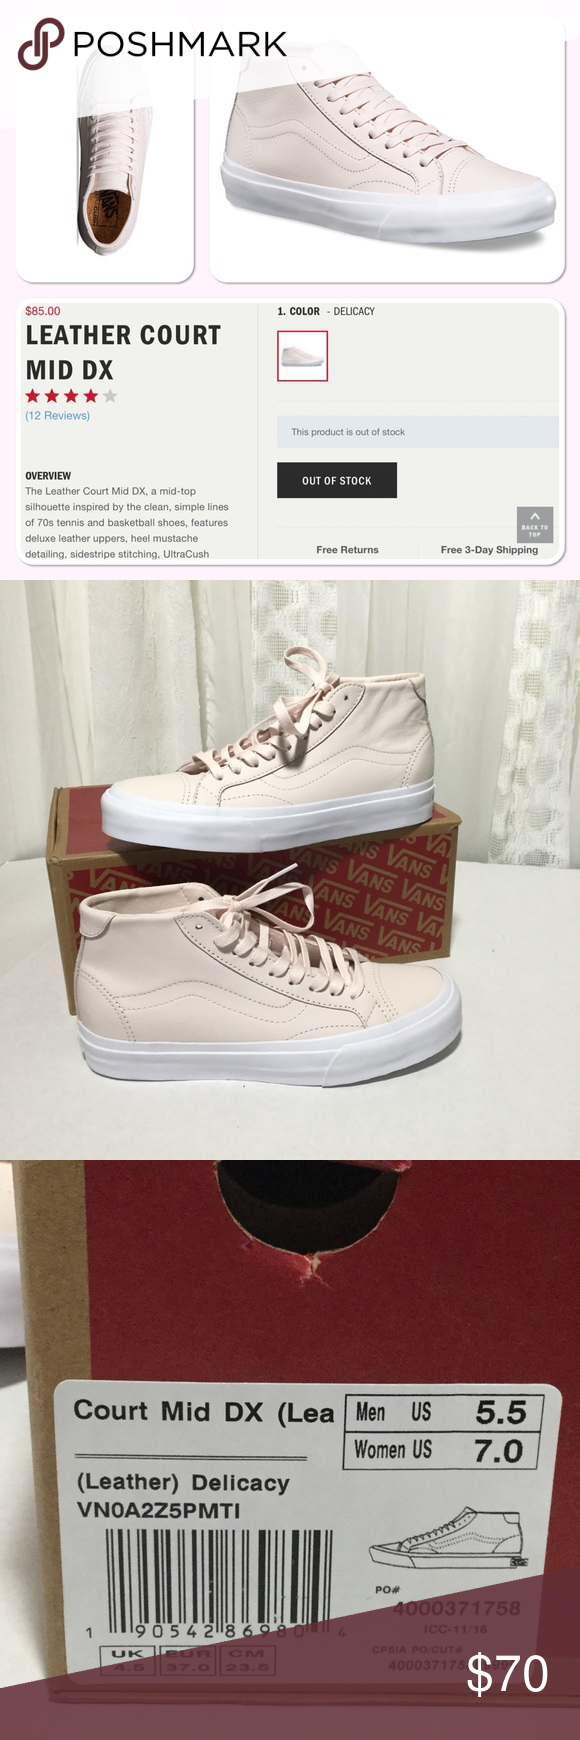 76b634bb4b VANS court mid DX delicacy (light pink) SZ 7 NWT Mid-top shoe. Has ...